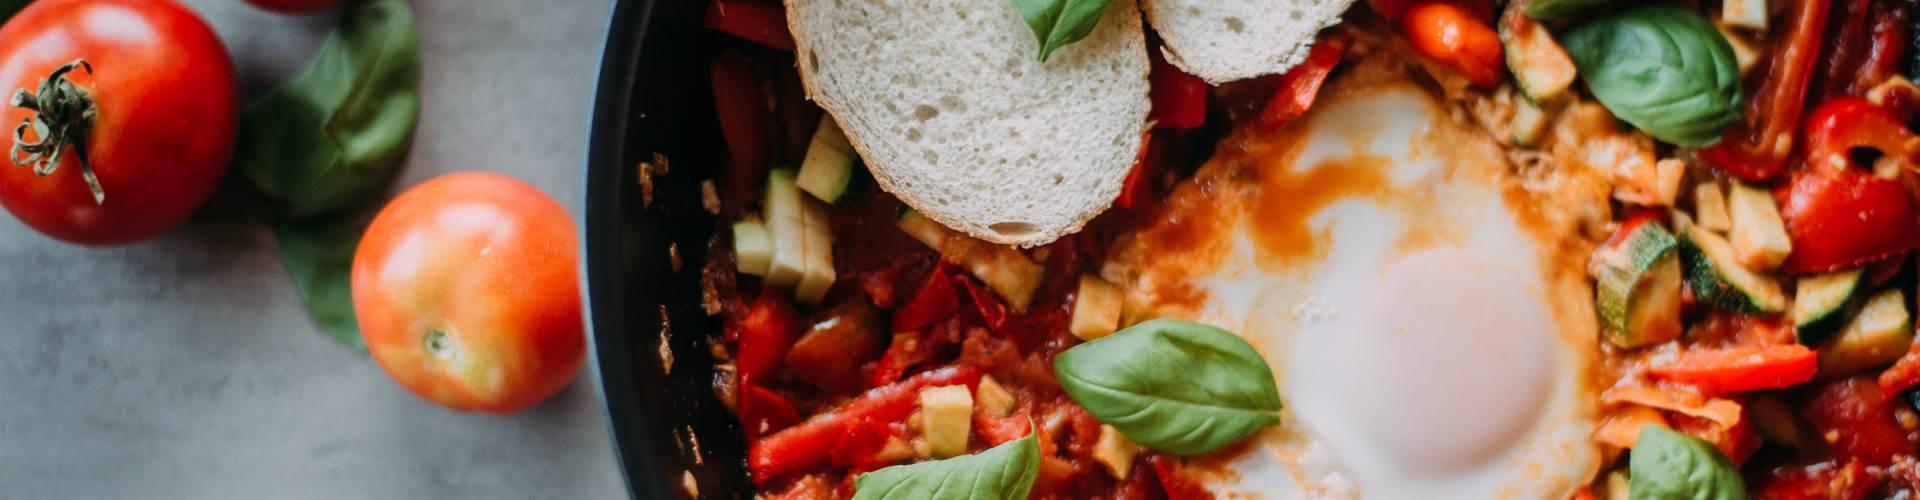 Lisa Doneff - Fotografin aus Franken - Lichtblicke Fotografie - Food-Fotografie